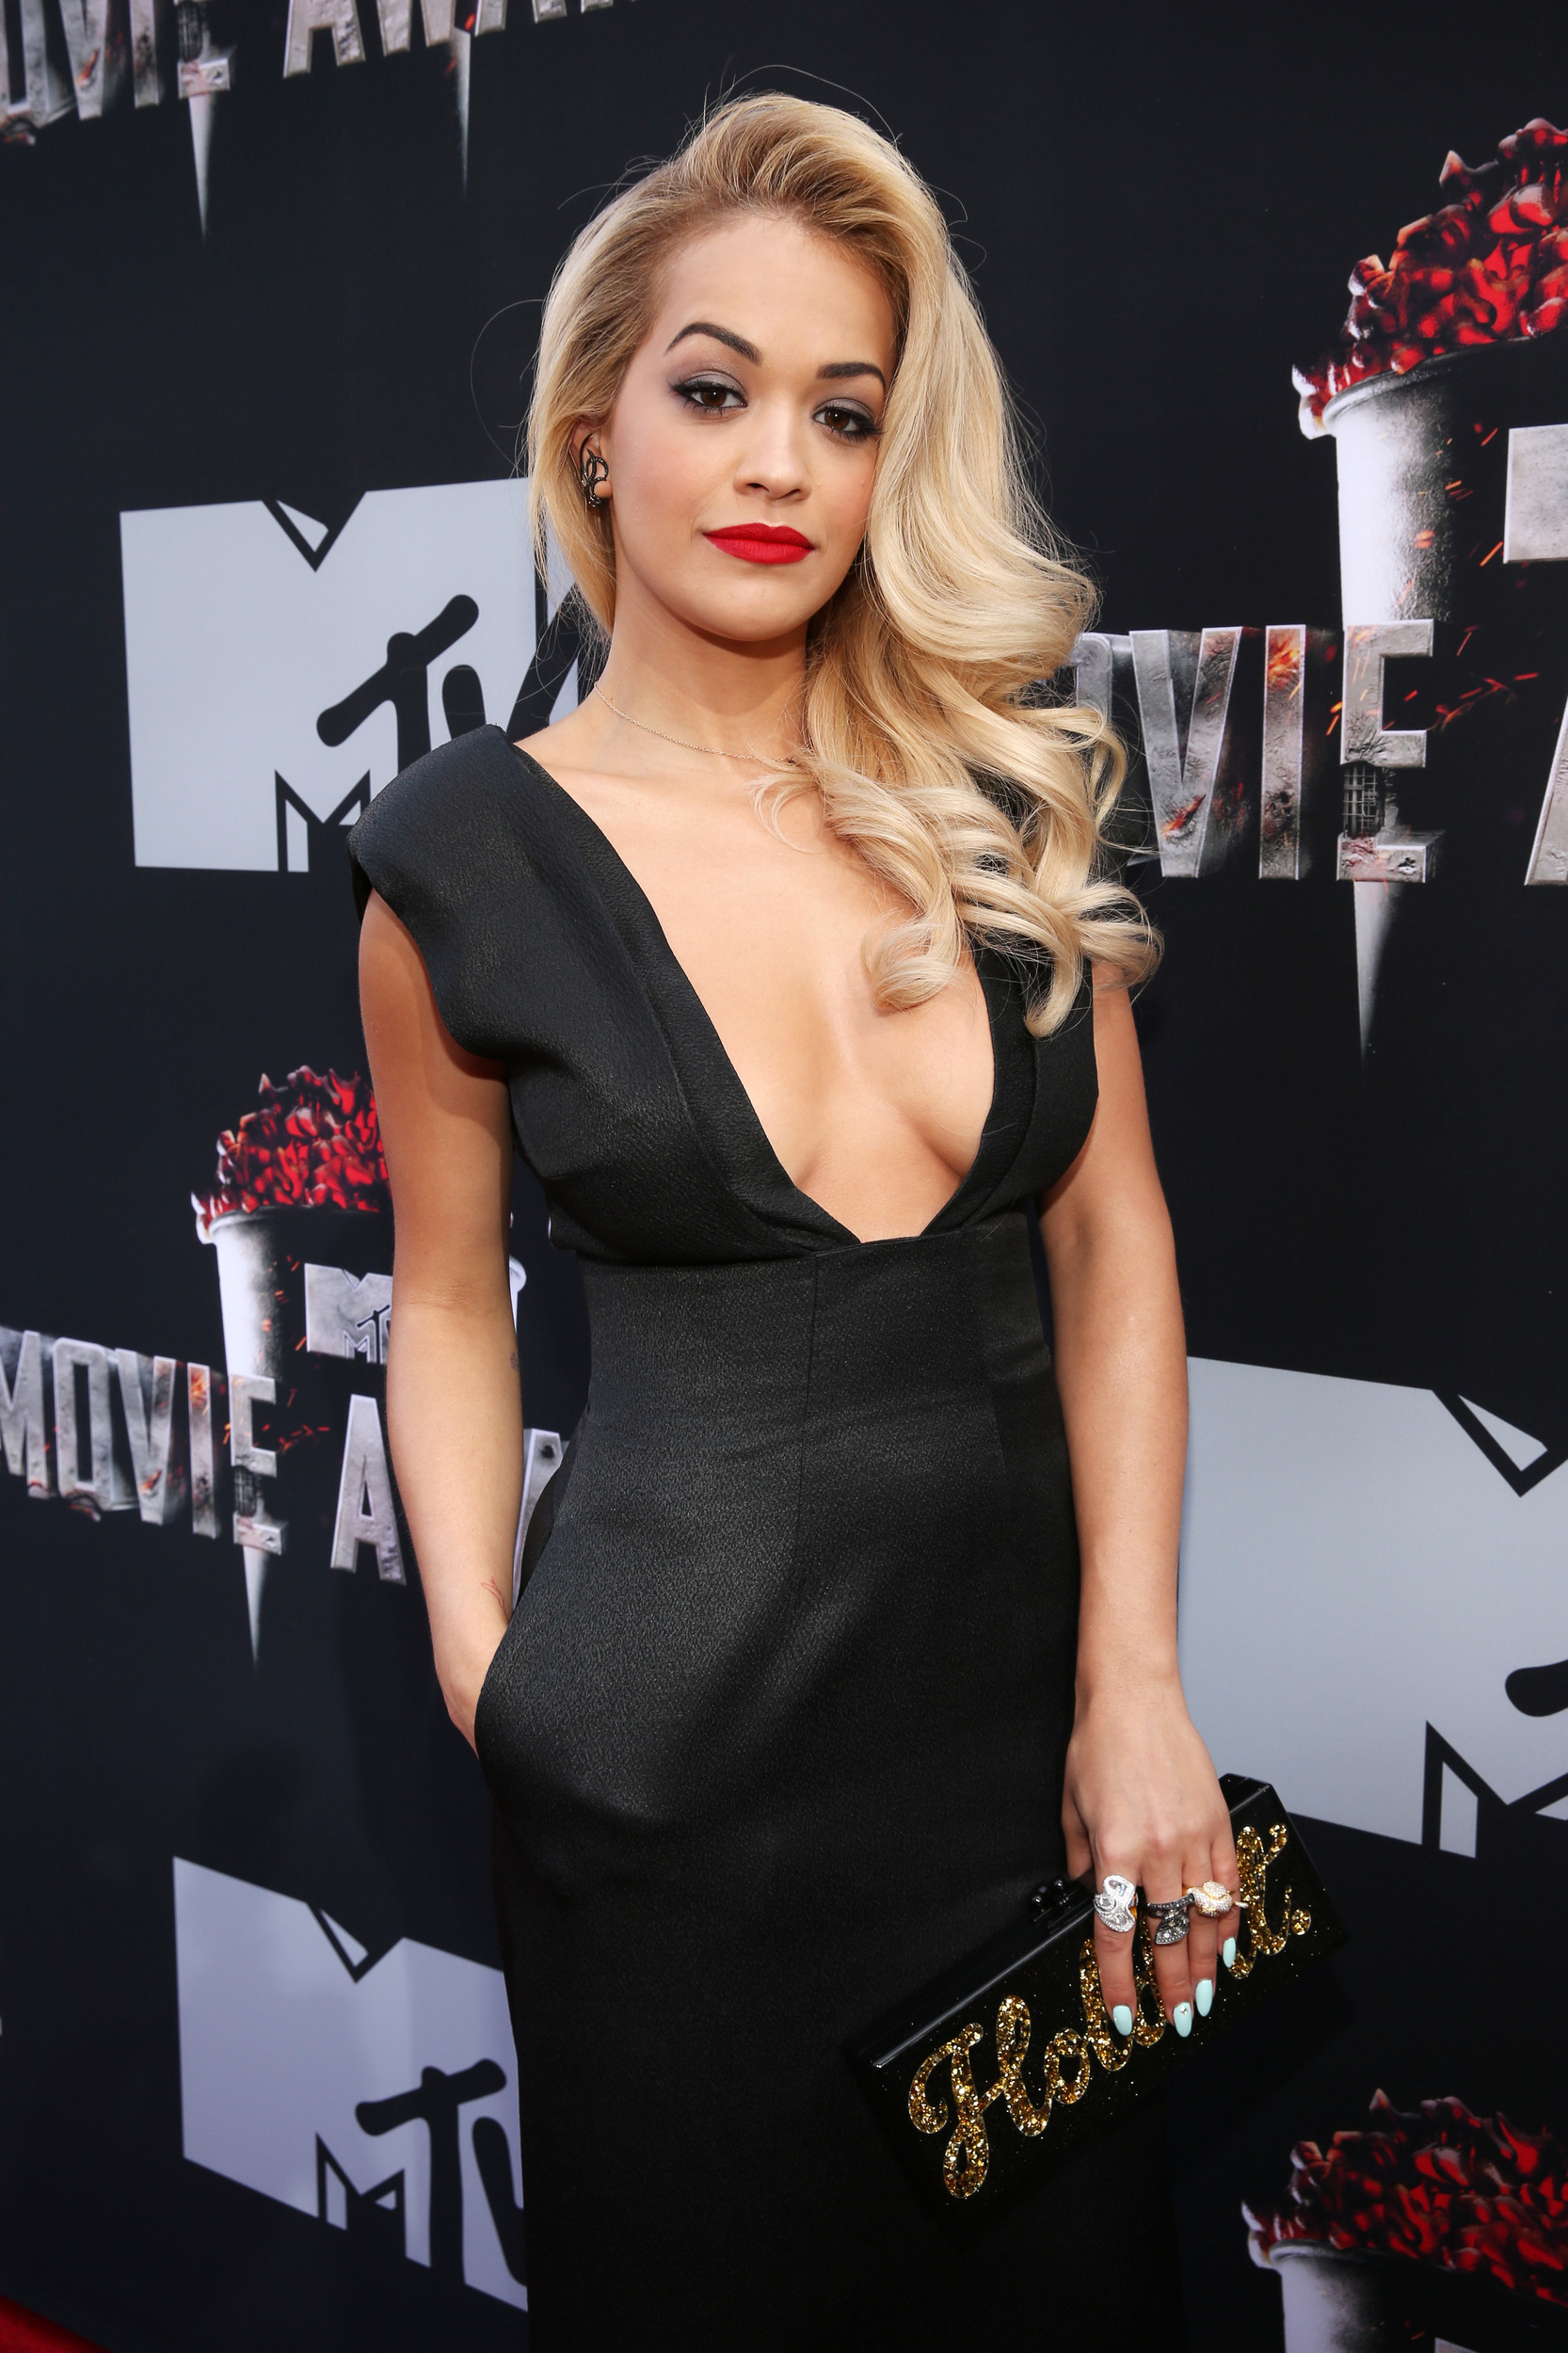 Rita-Ora 50 Sombras MTV Movie Awards abril 2014 2